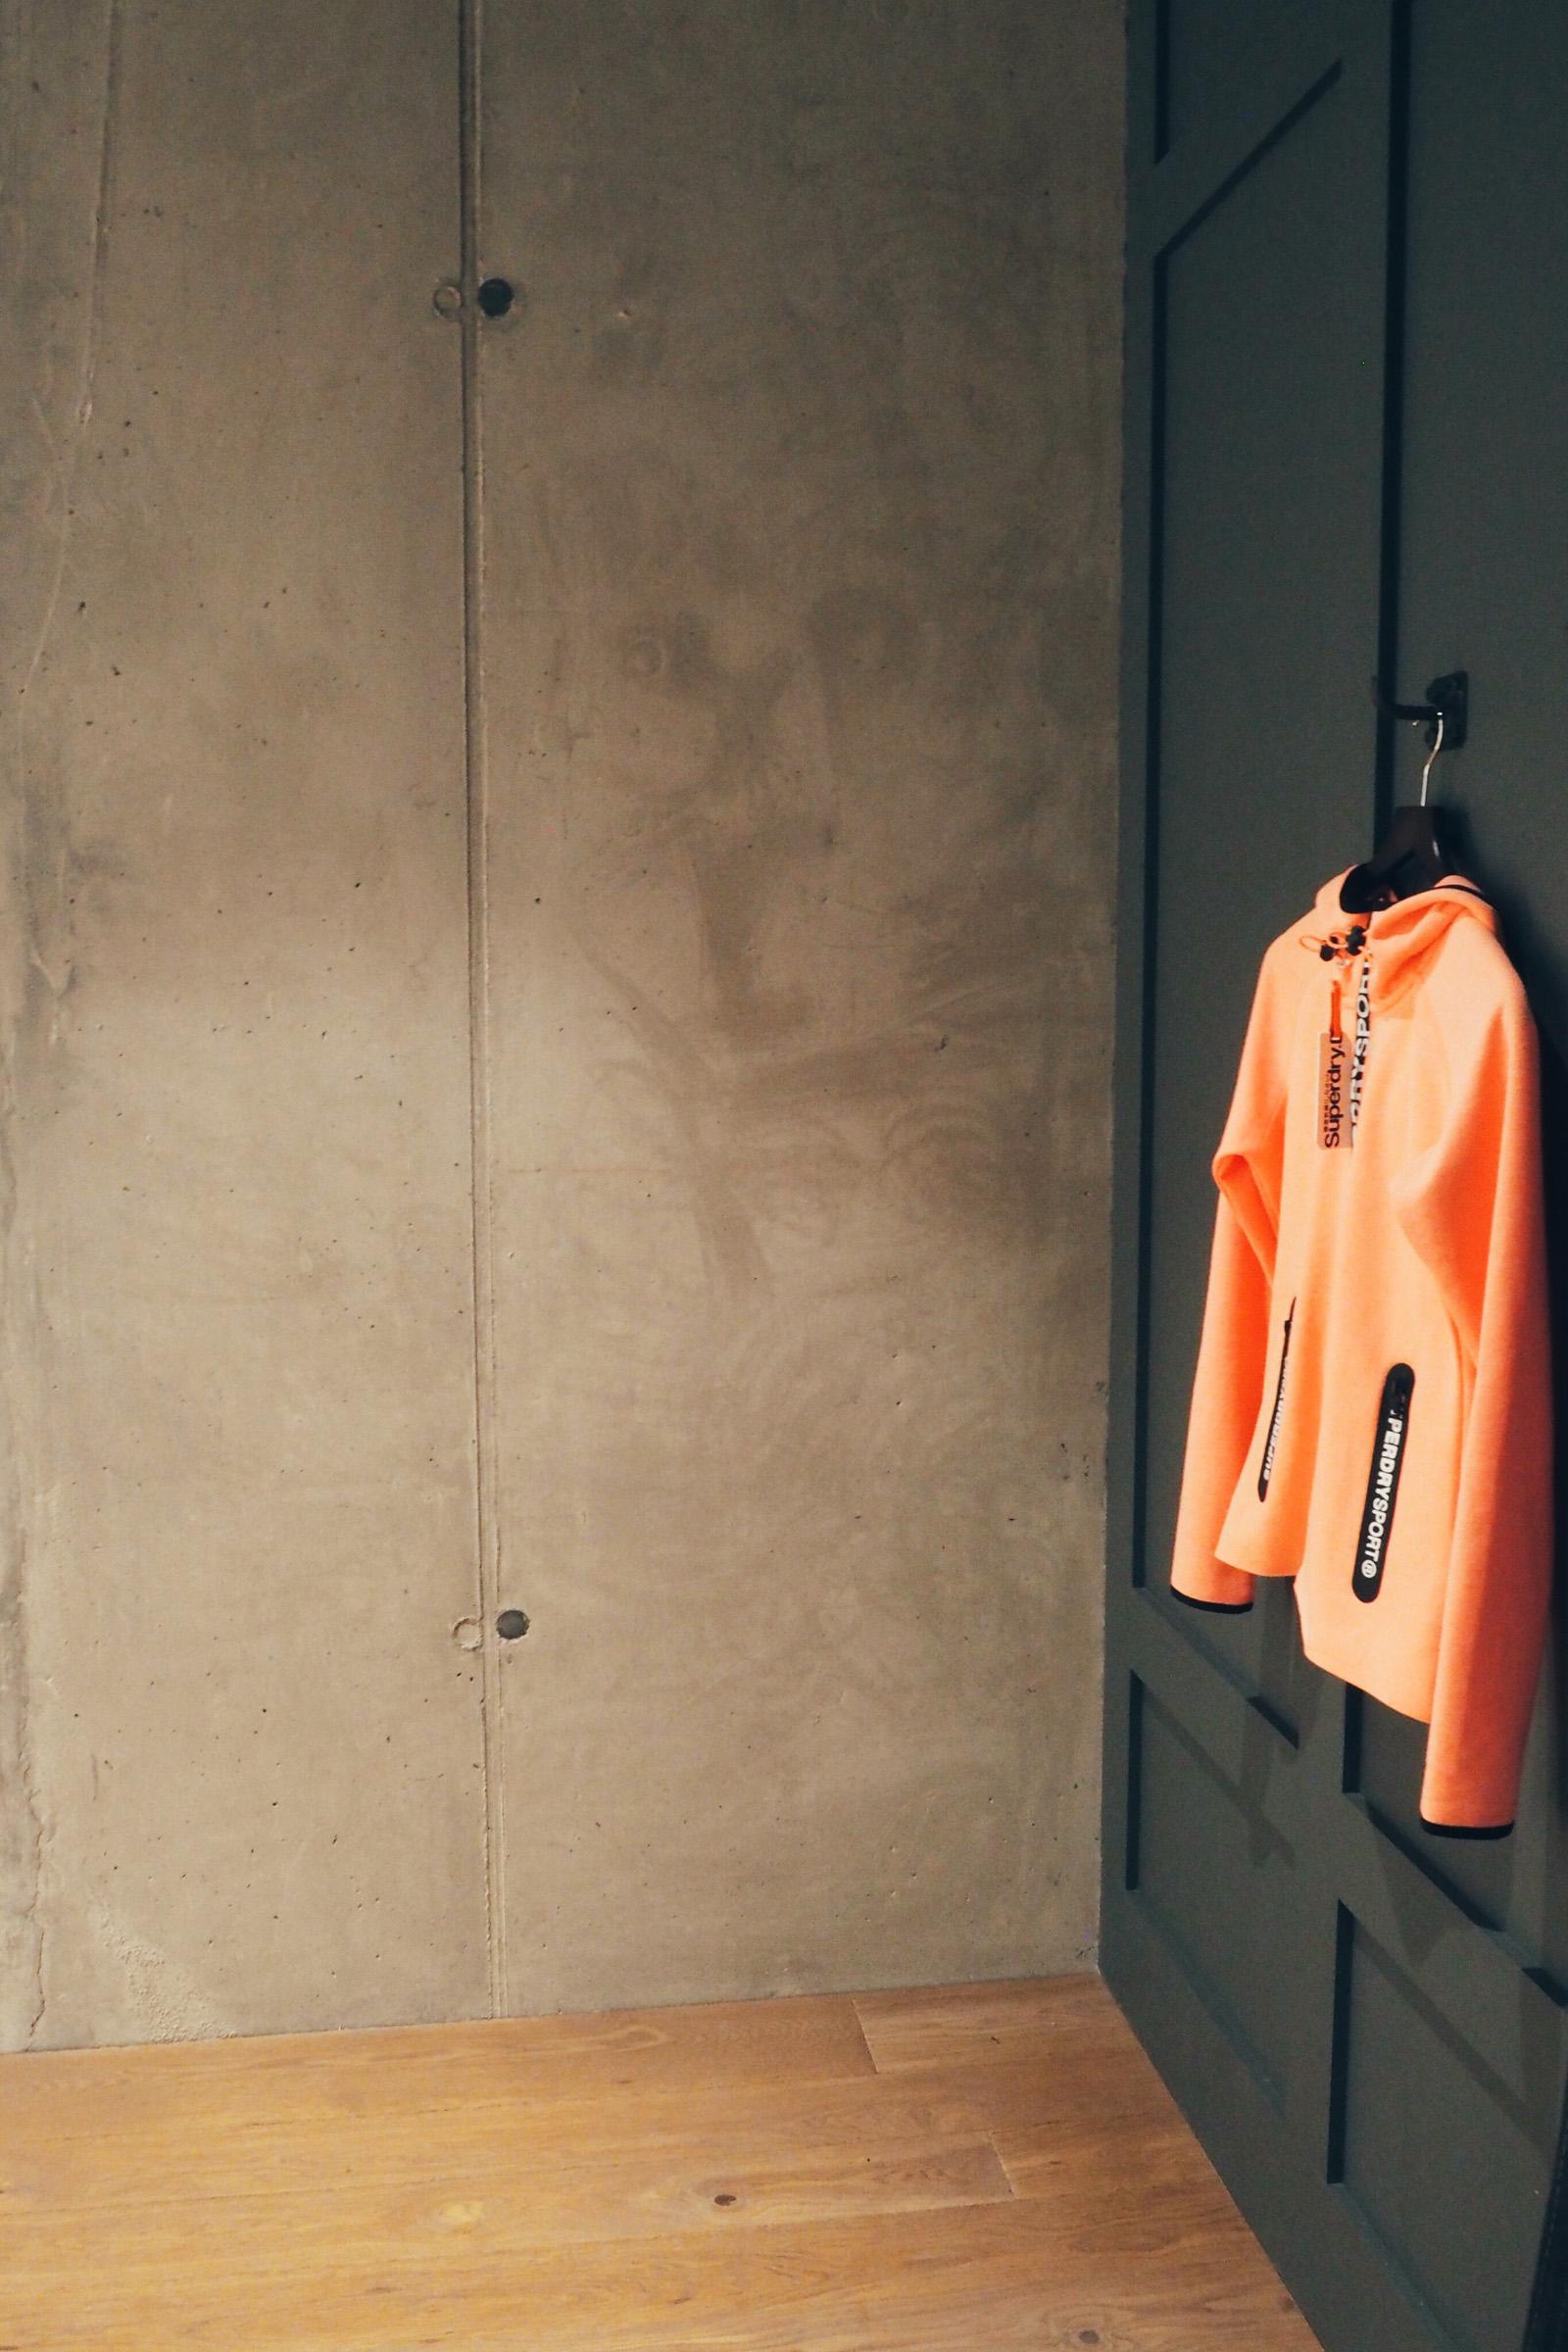 PlusCity-LeondingSnapchat-Brandhunting-Shopping-Haul-Suechtig-nach-Lifestyleblog-Fashionblog-Foodblog-Oberoesterreich-Linz-12-Superdry